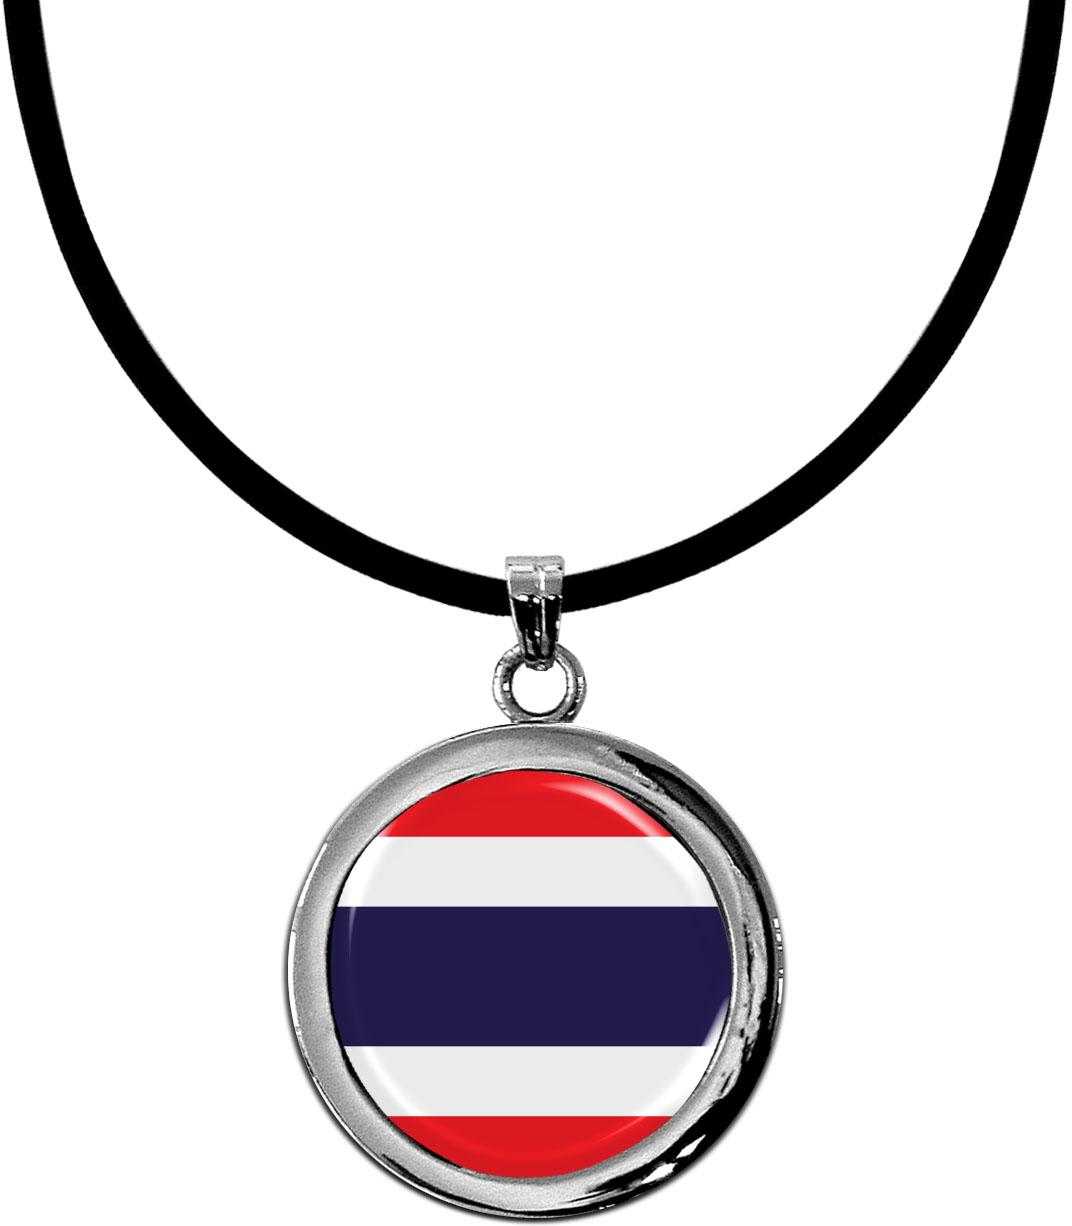 Kettenanhänger / Thailand / Silikonband mit Silberverschluss